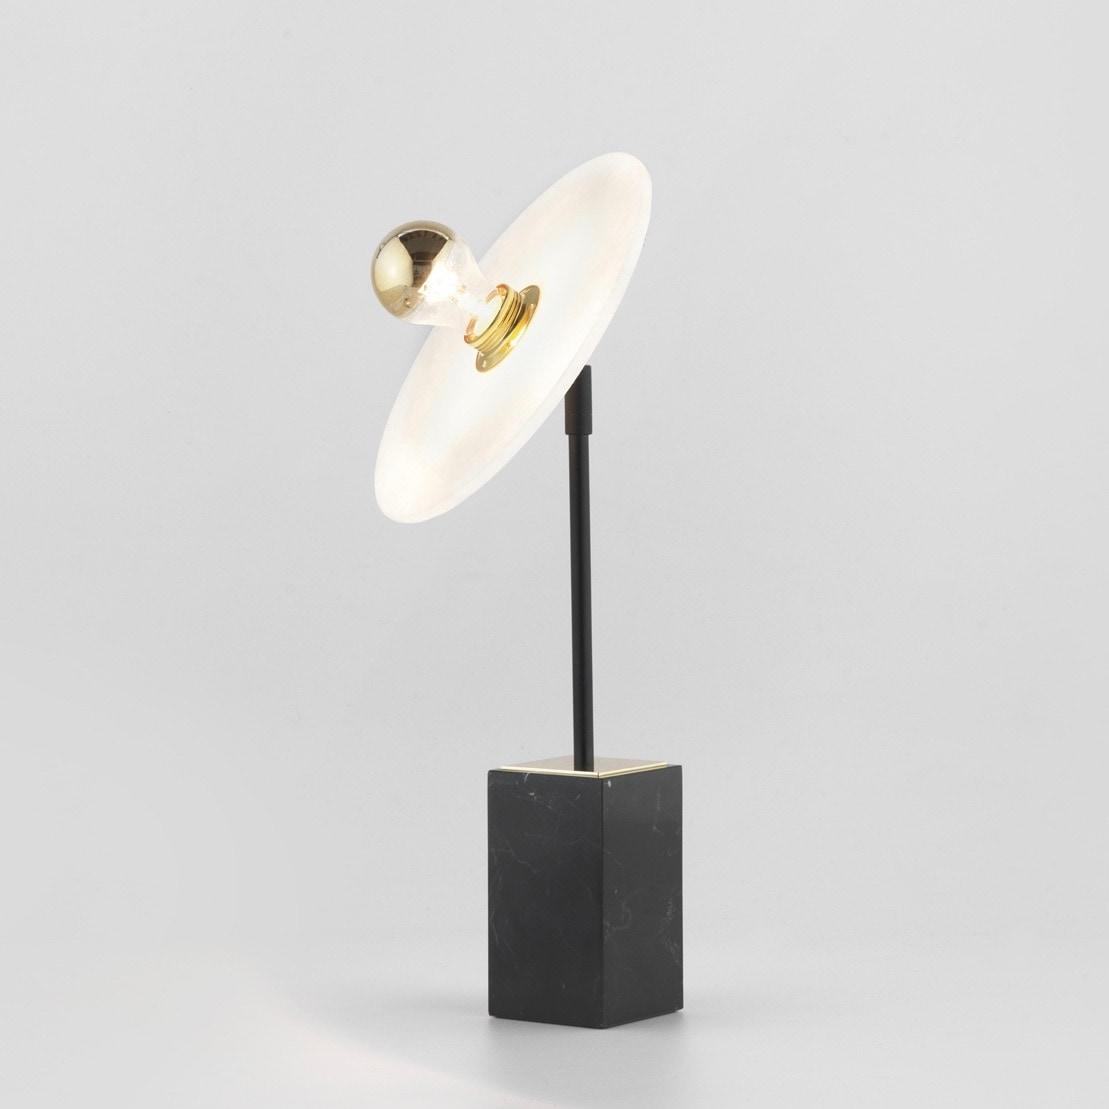 Sun light bordslampa svart/alabaster